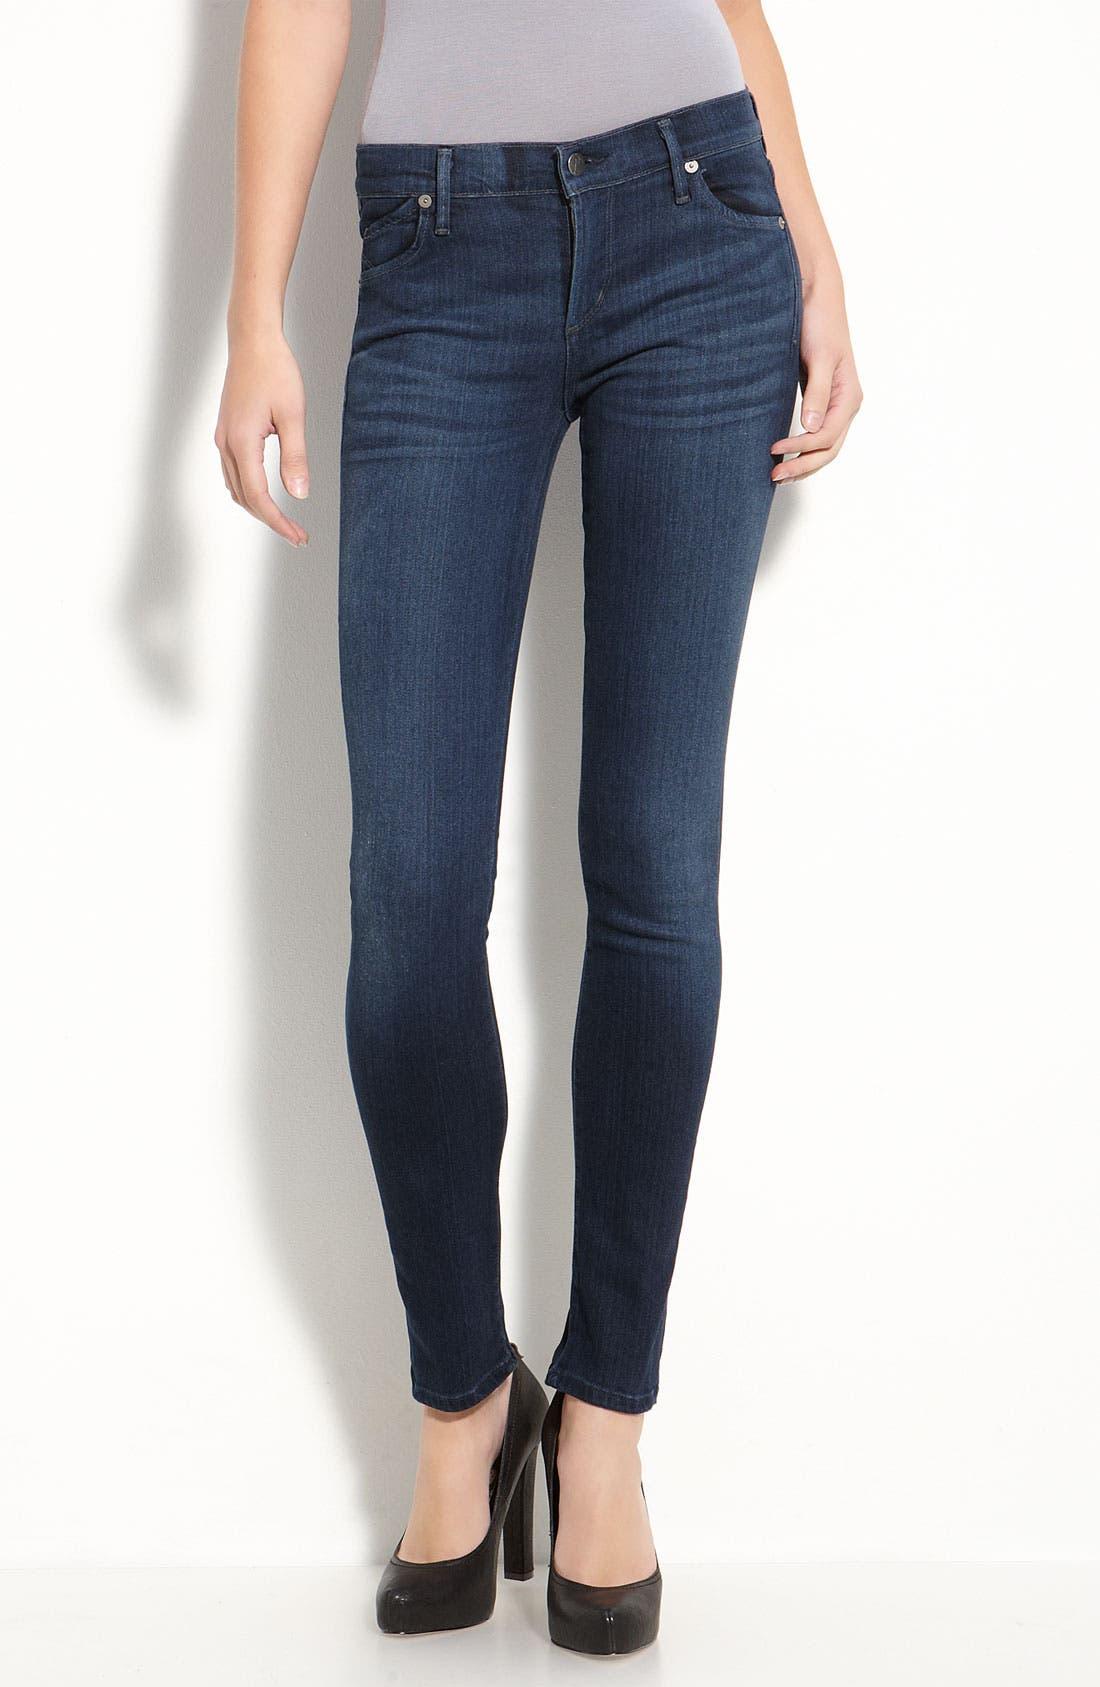 Alternate Image 2  - Citizens of Humanity 'Second Skin' Stretch Denim Jeans (Satellite Wash)